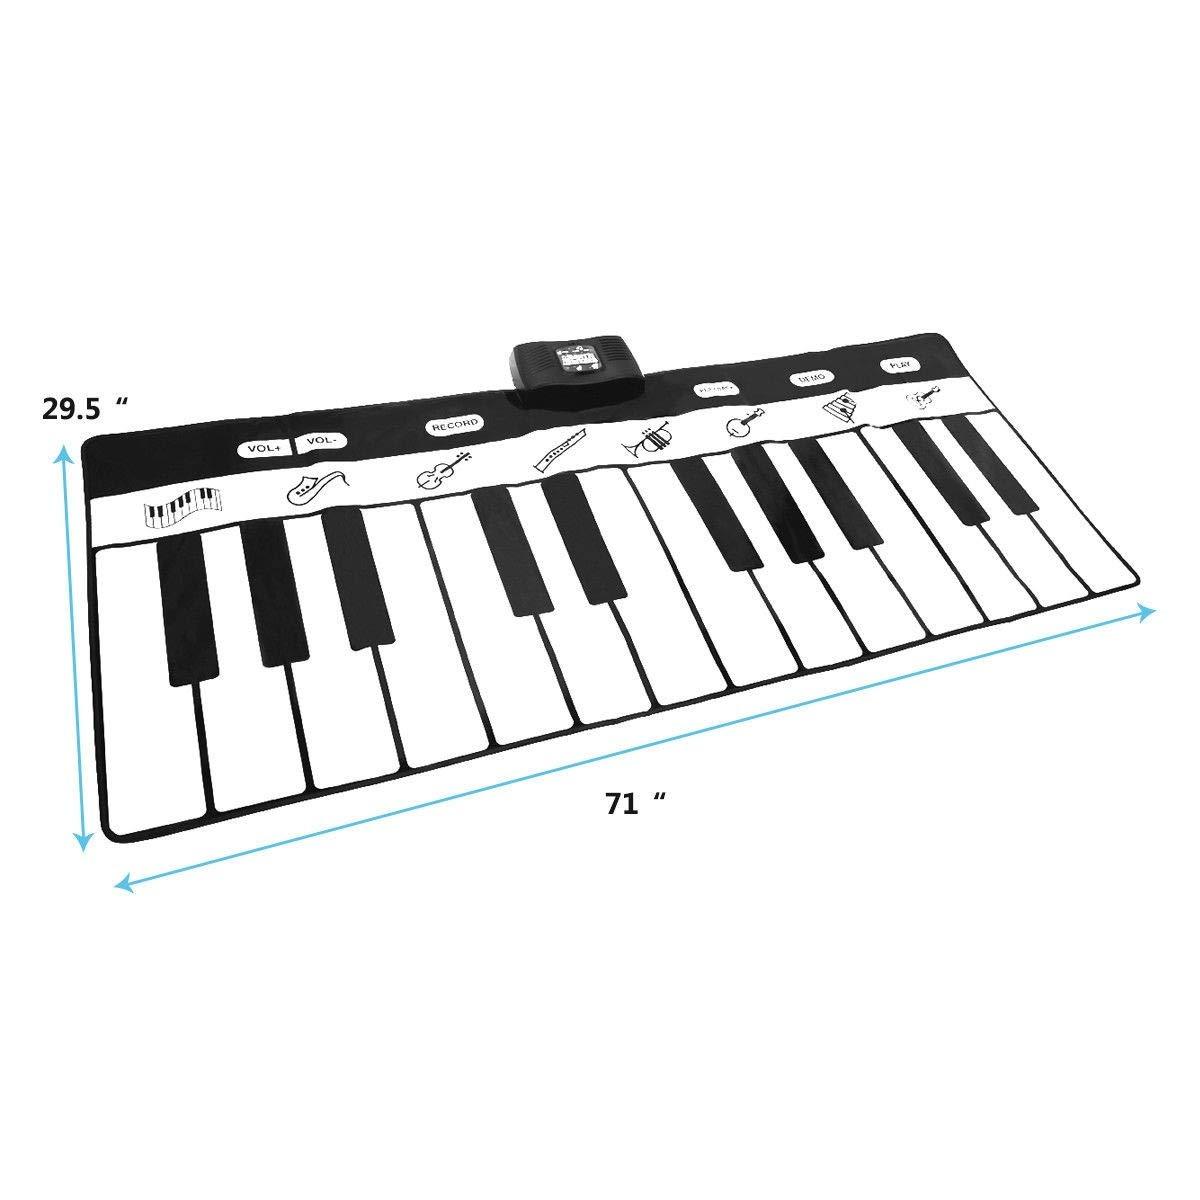 Dayanaprincess New Kids 24 Key Gigantic Piano Keyboard with 8 Instrument Settings Learning Children Play Set Fun Entertaining Book Melody by Dayanaprincess (Image #2)